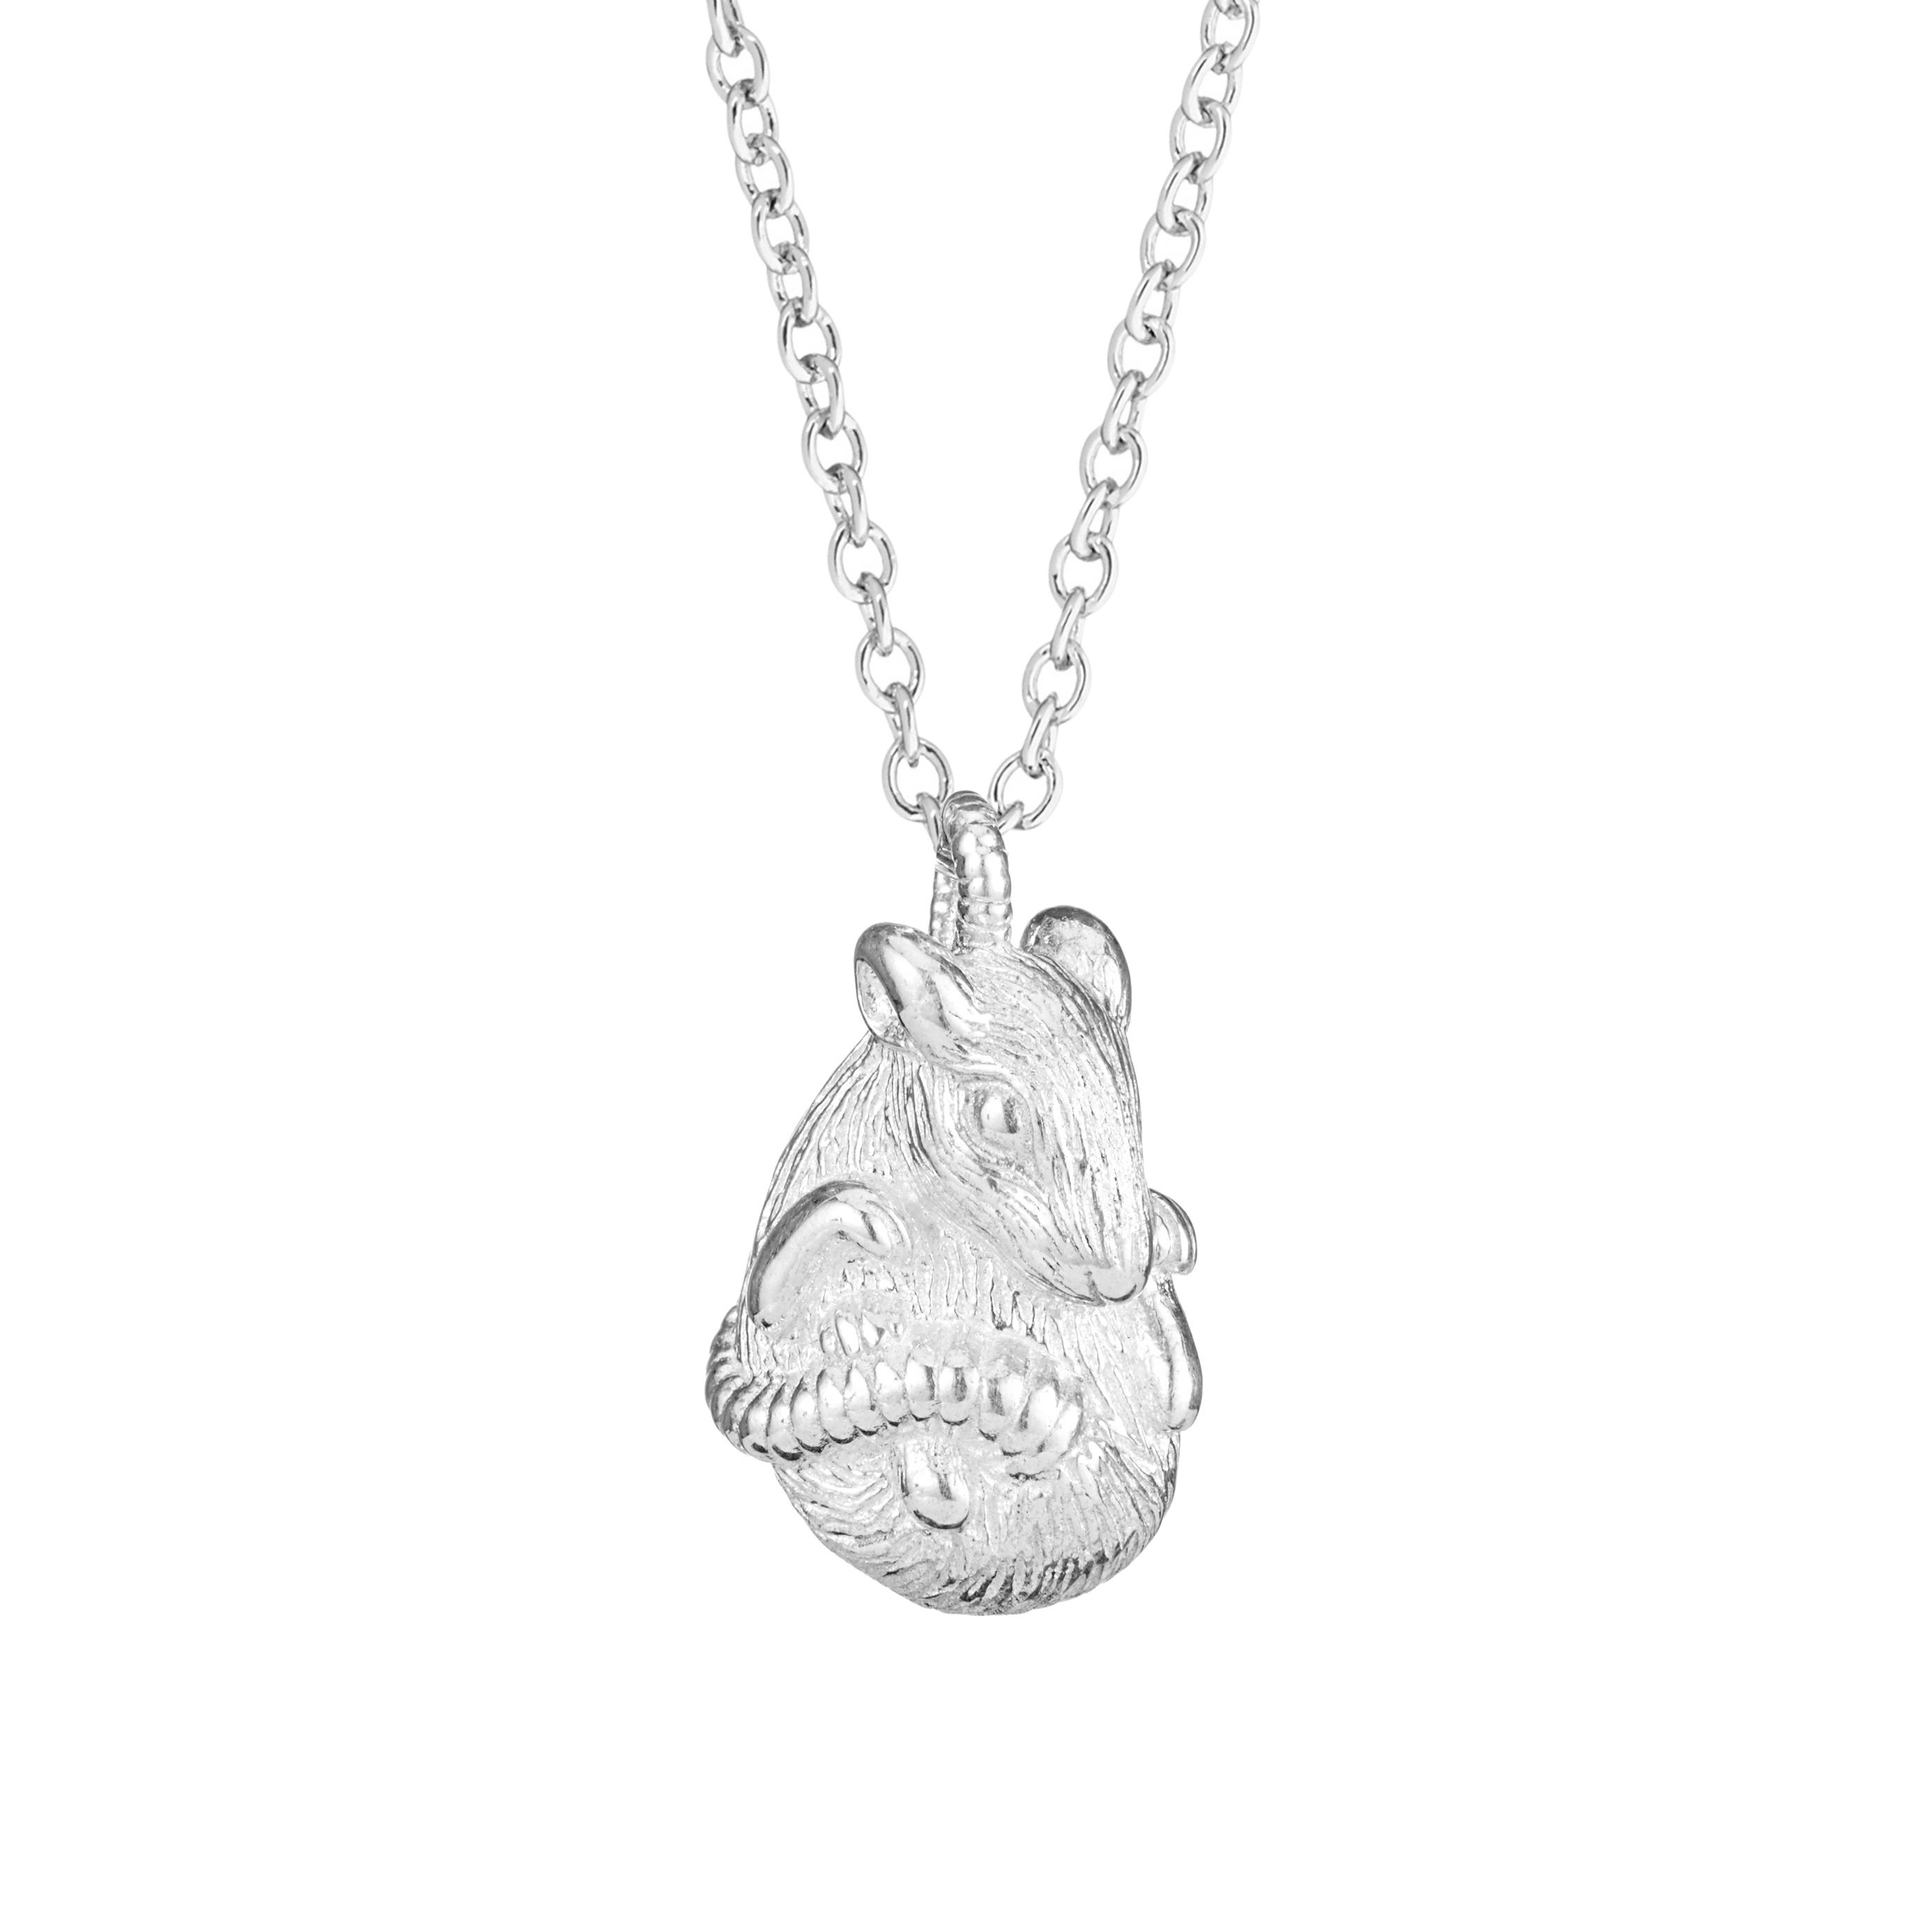 Chinese zodiac pendant necklace (rat)